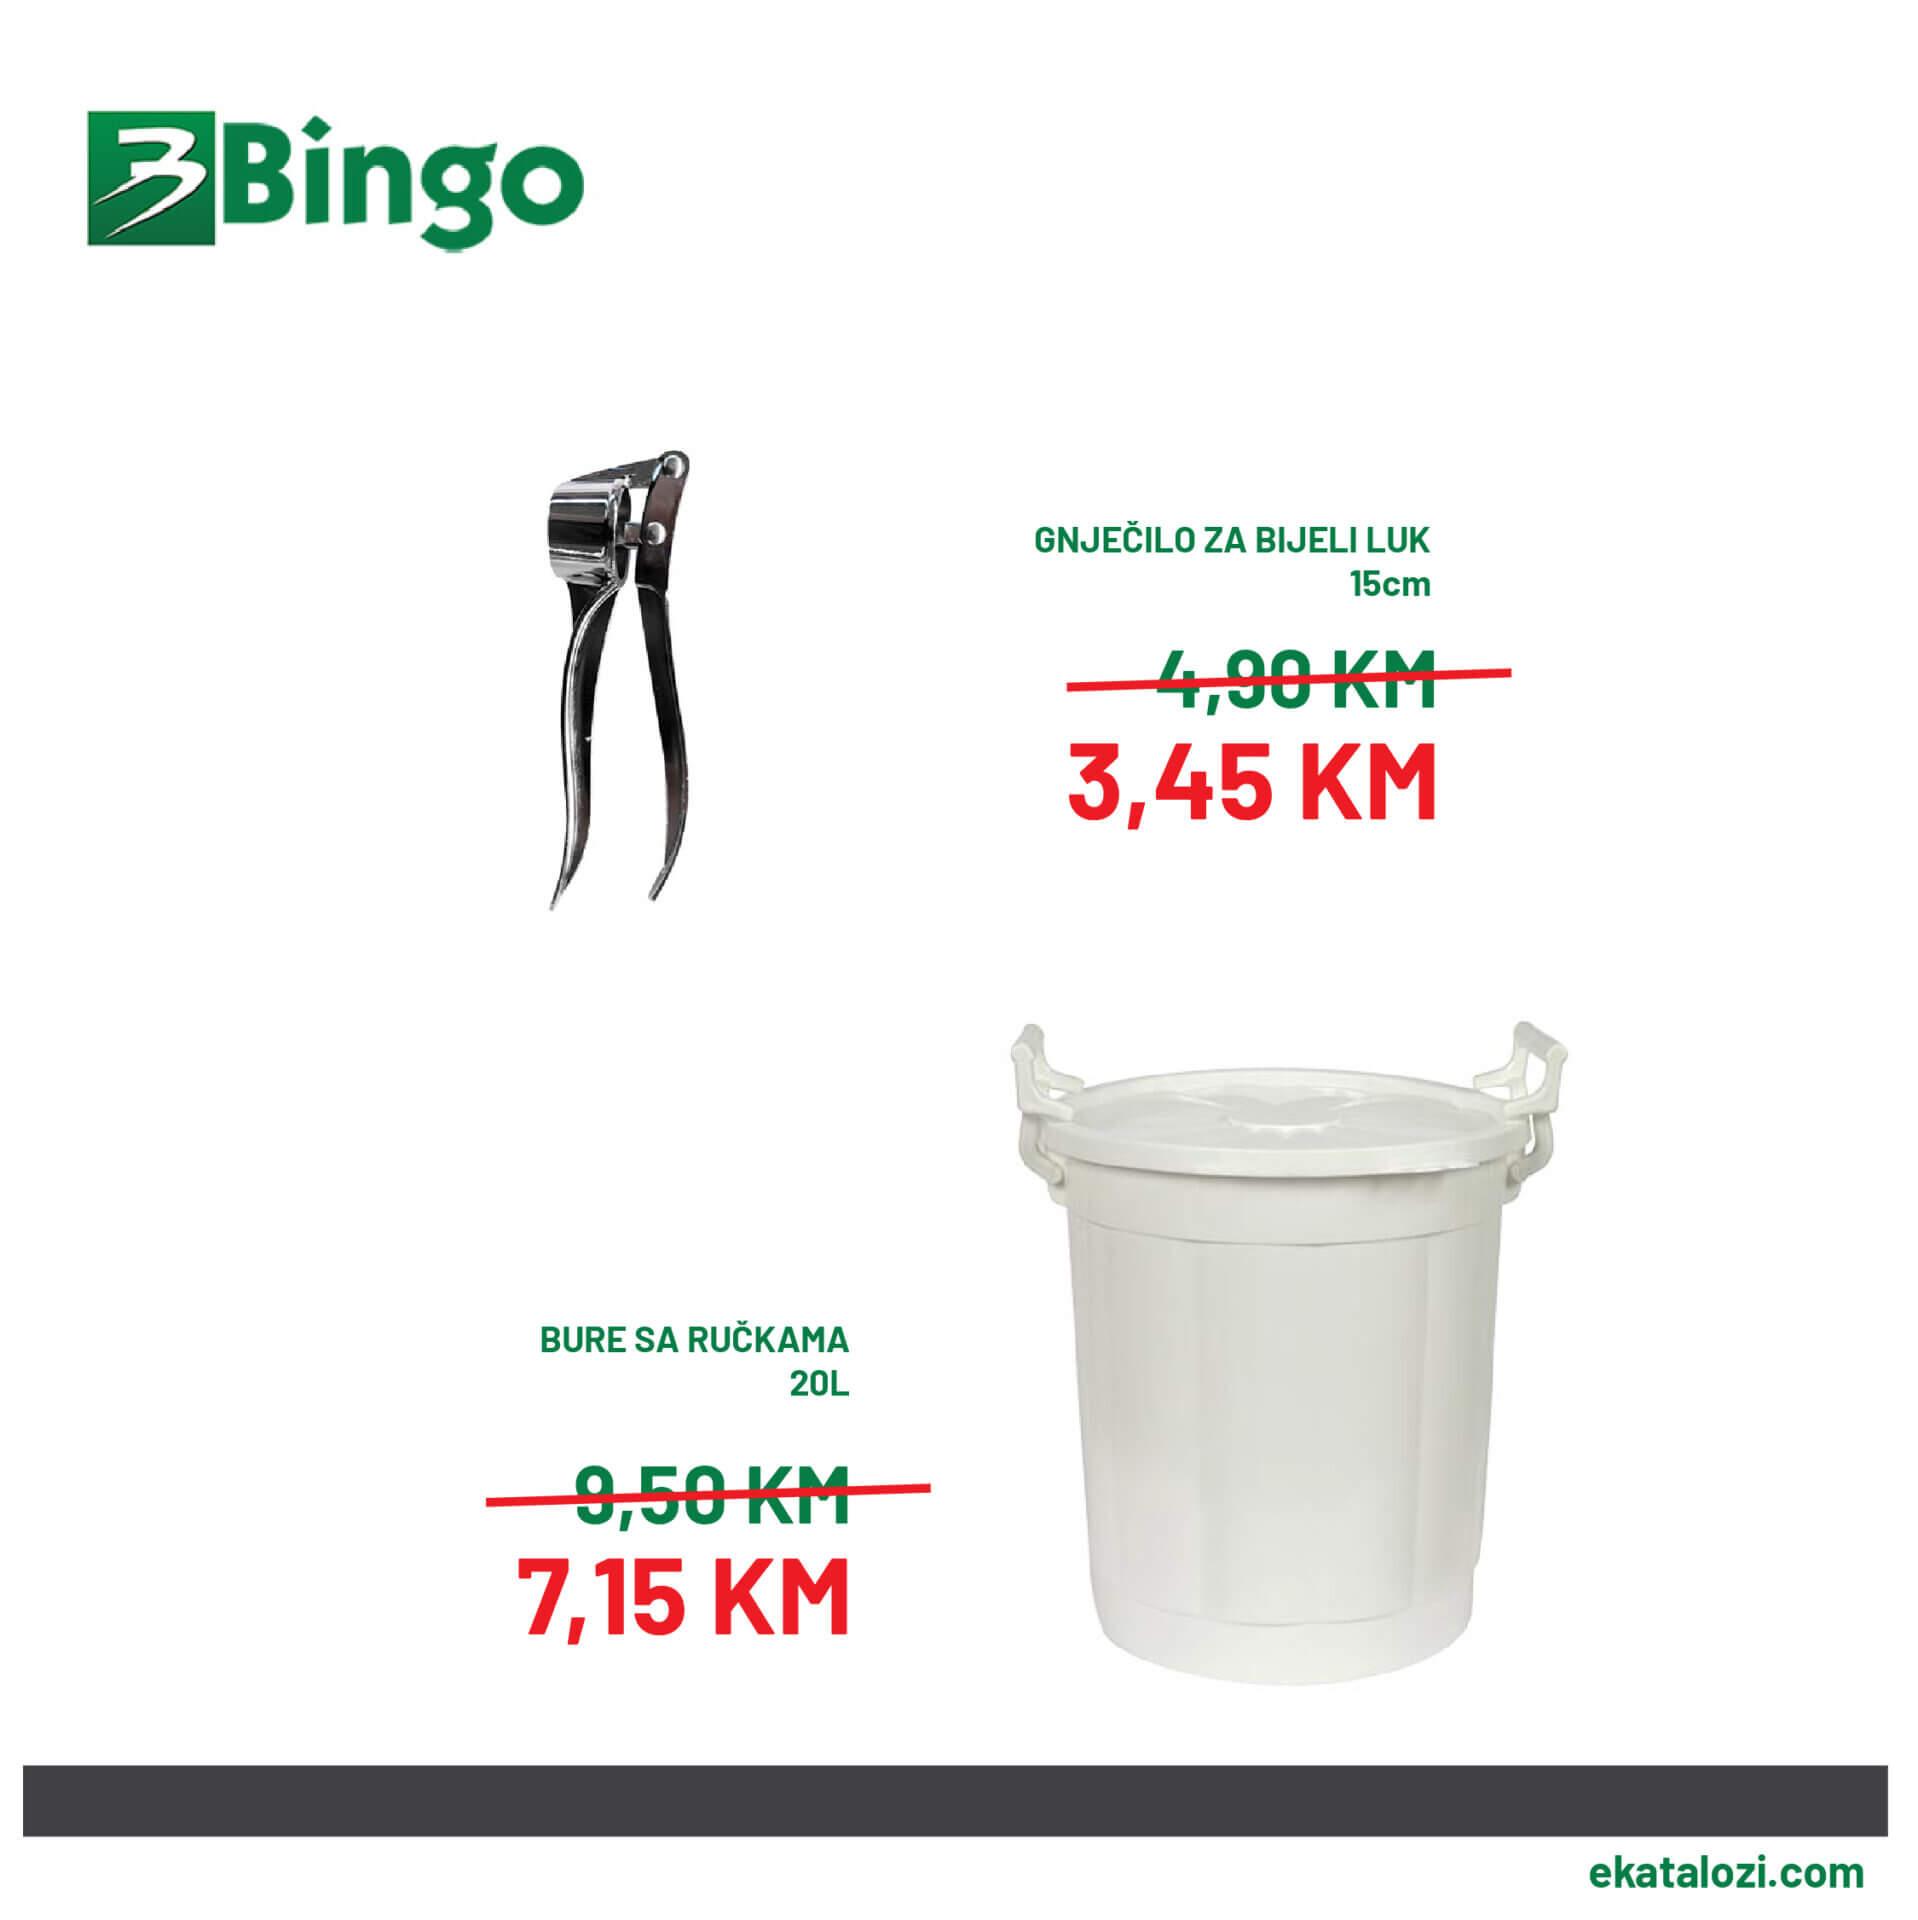 BINGO Akcija SEPTEMBAR 2021 12.9.2021. 14.9.2021 2